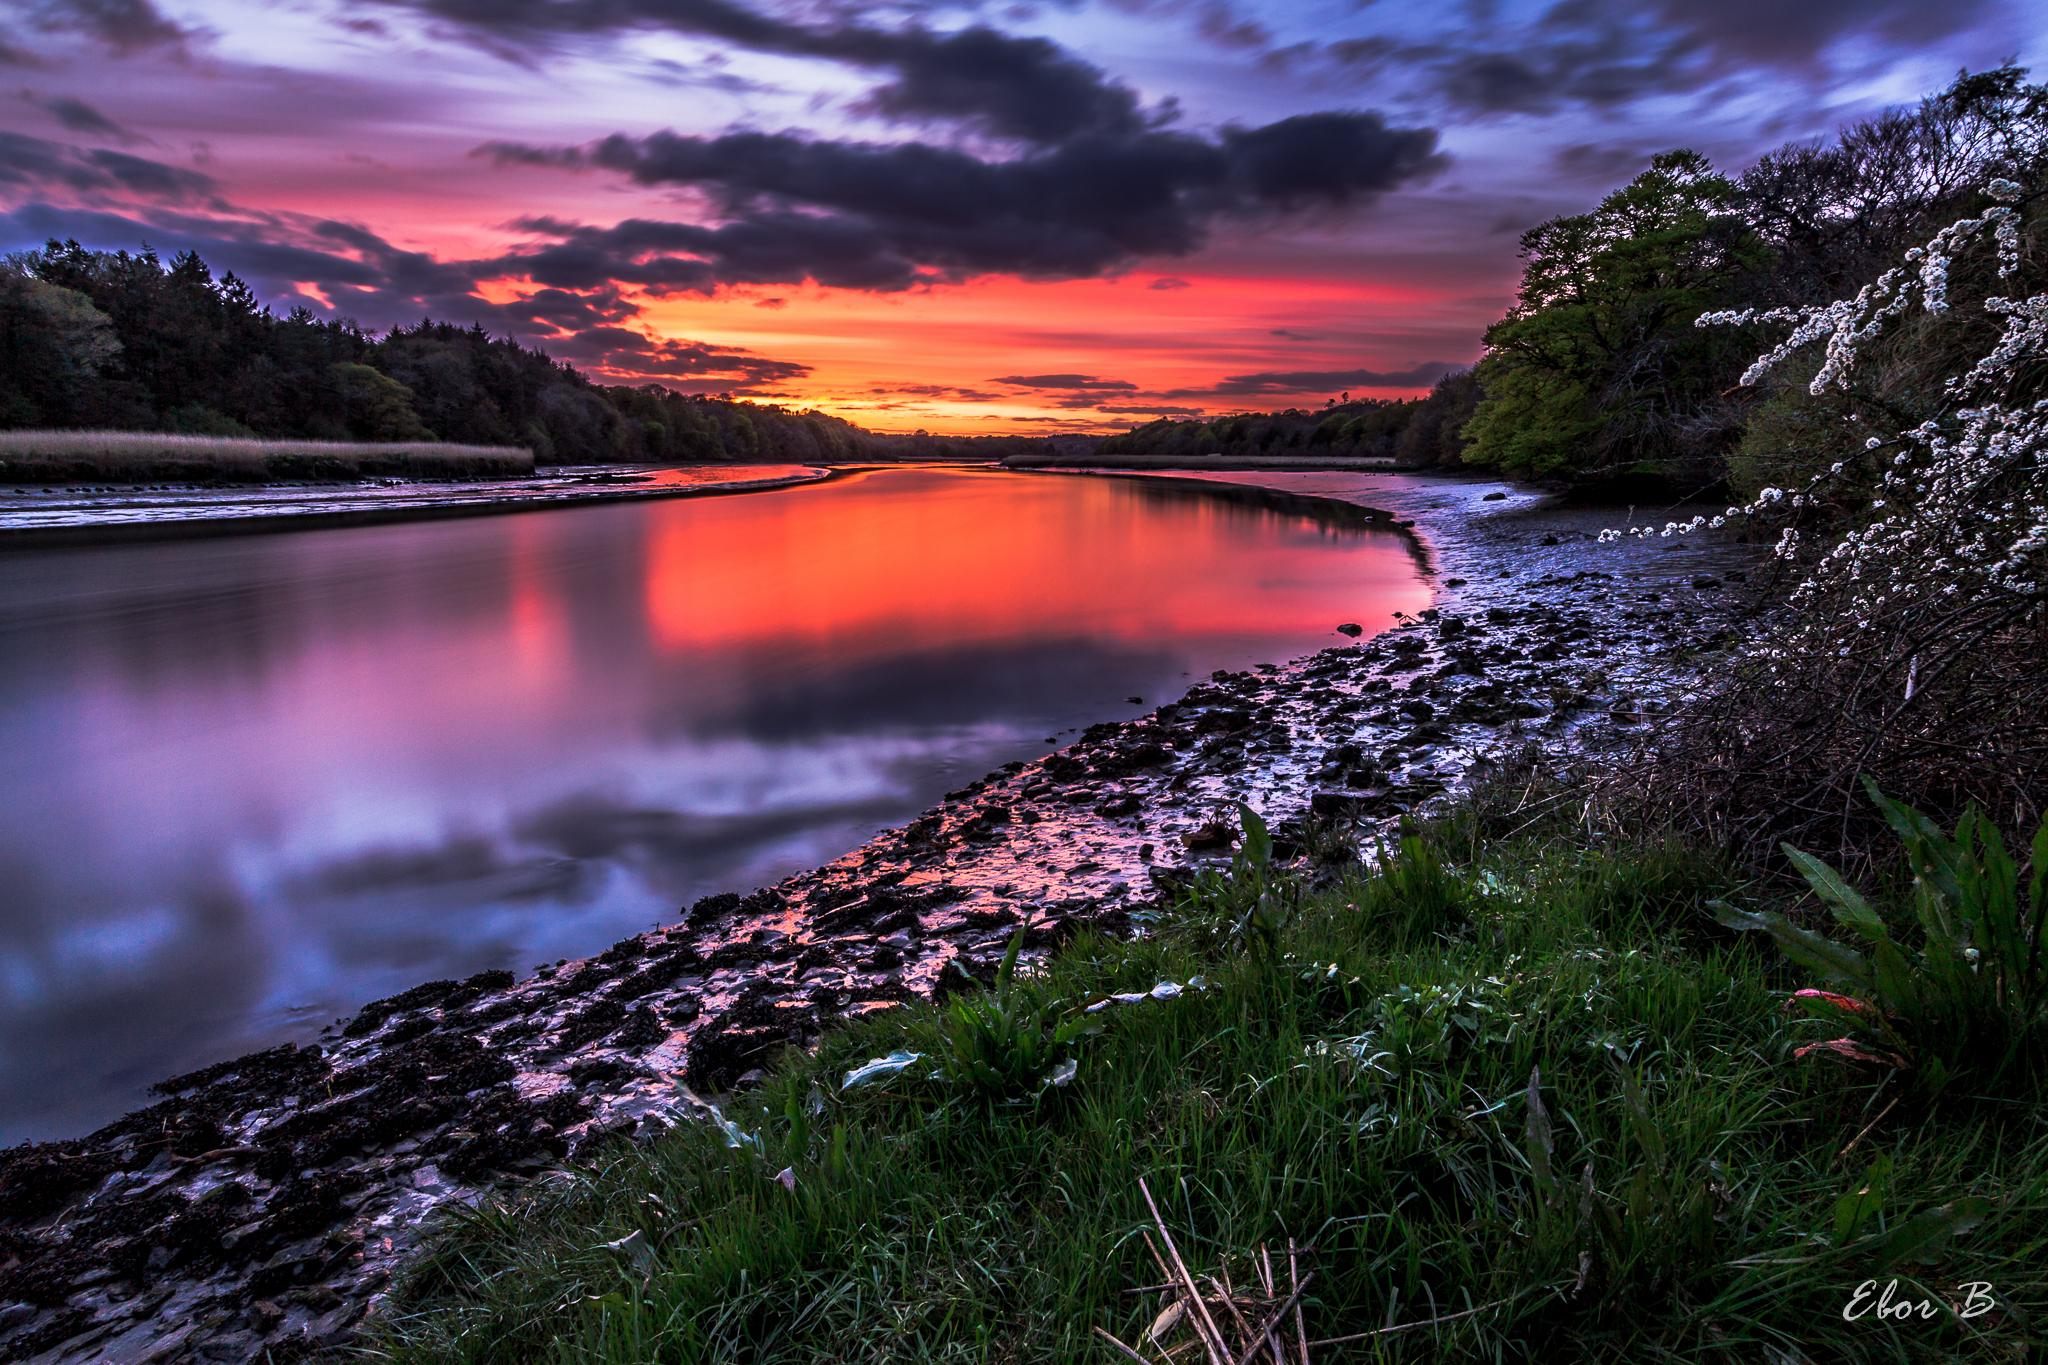 Sunset at Shippool